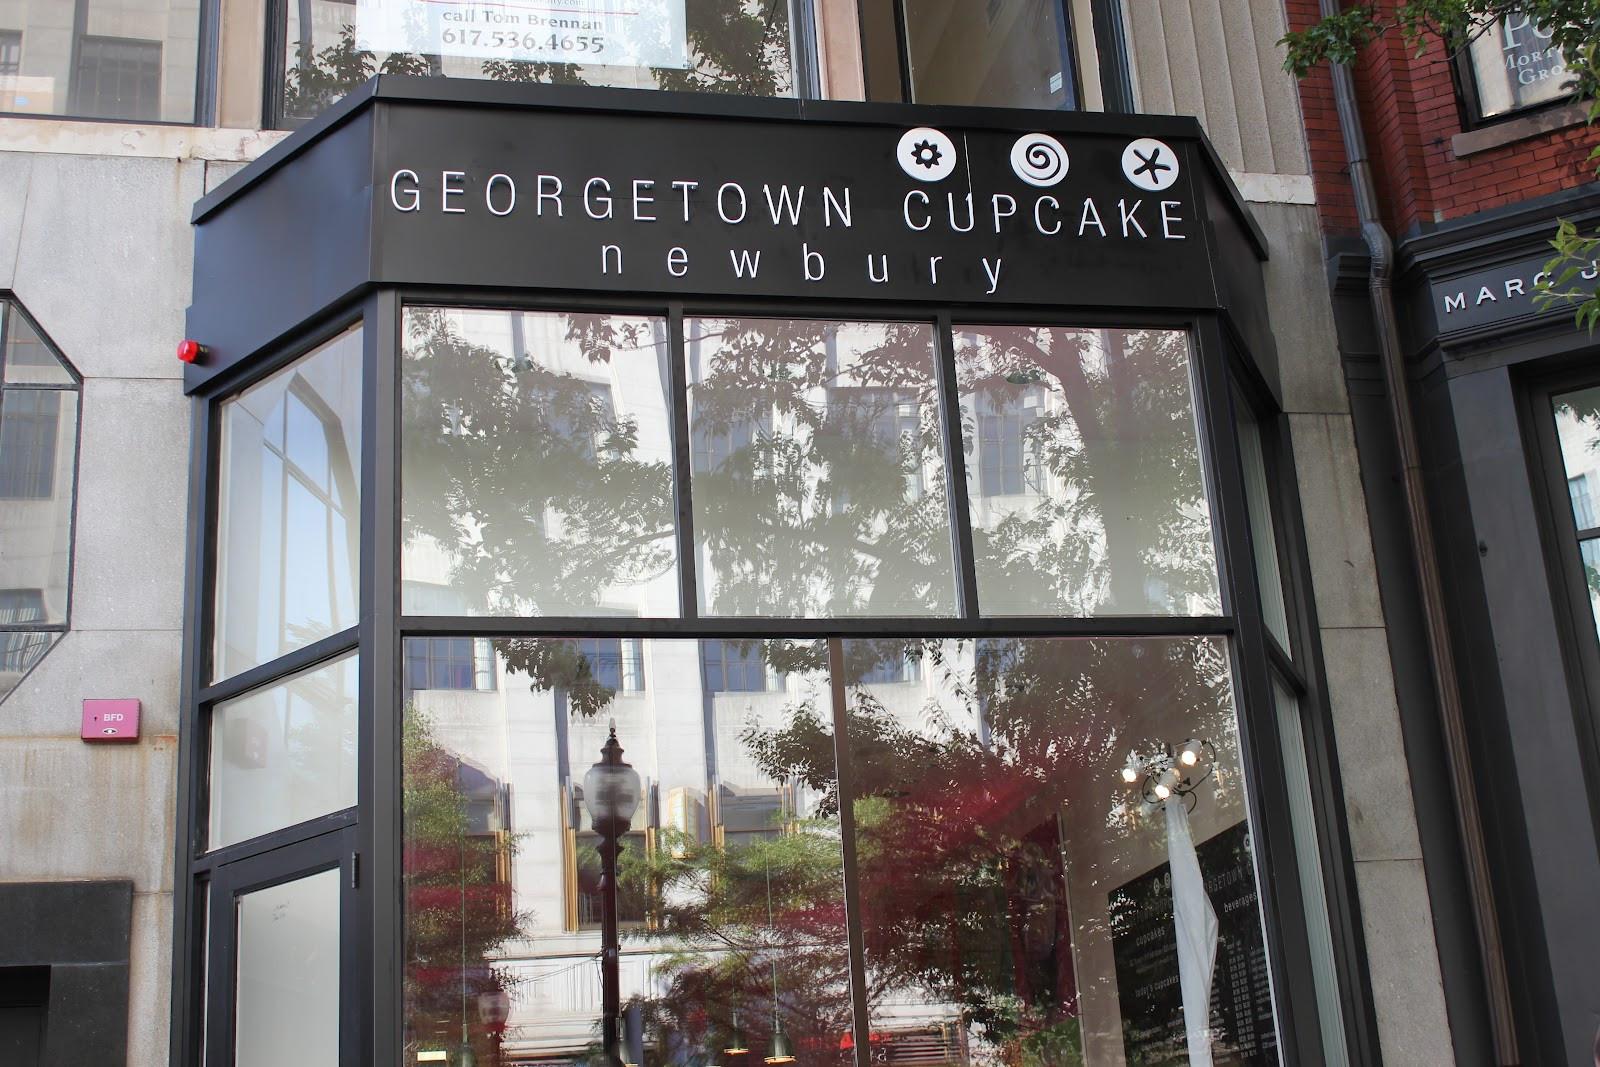 Georgetown Cupcakes Boston  Delicious Dishings Geor own Cupcake Newbury